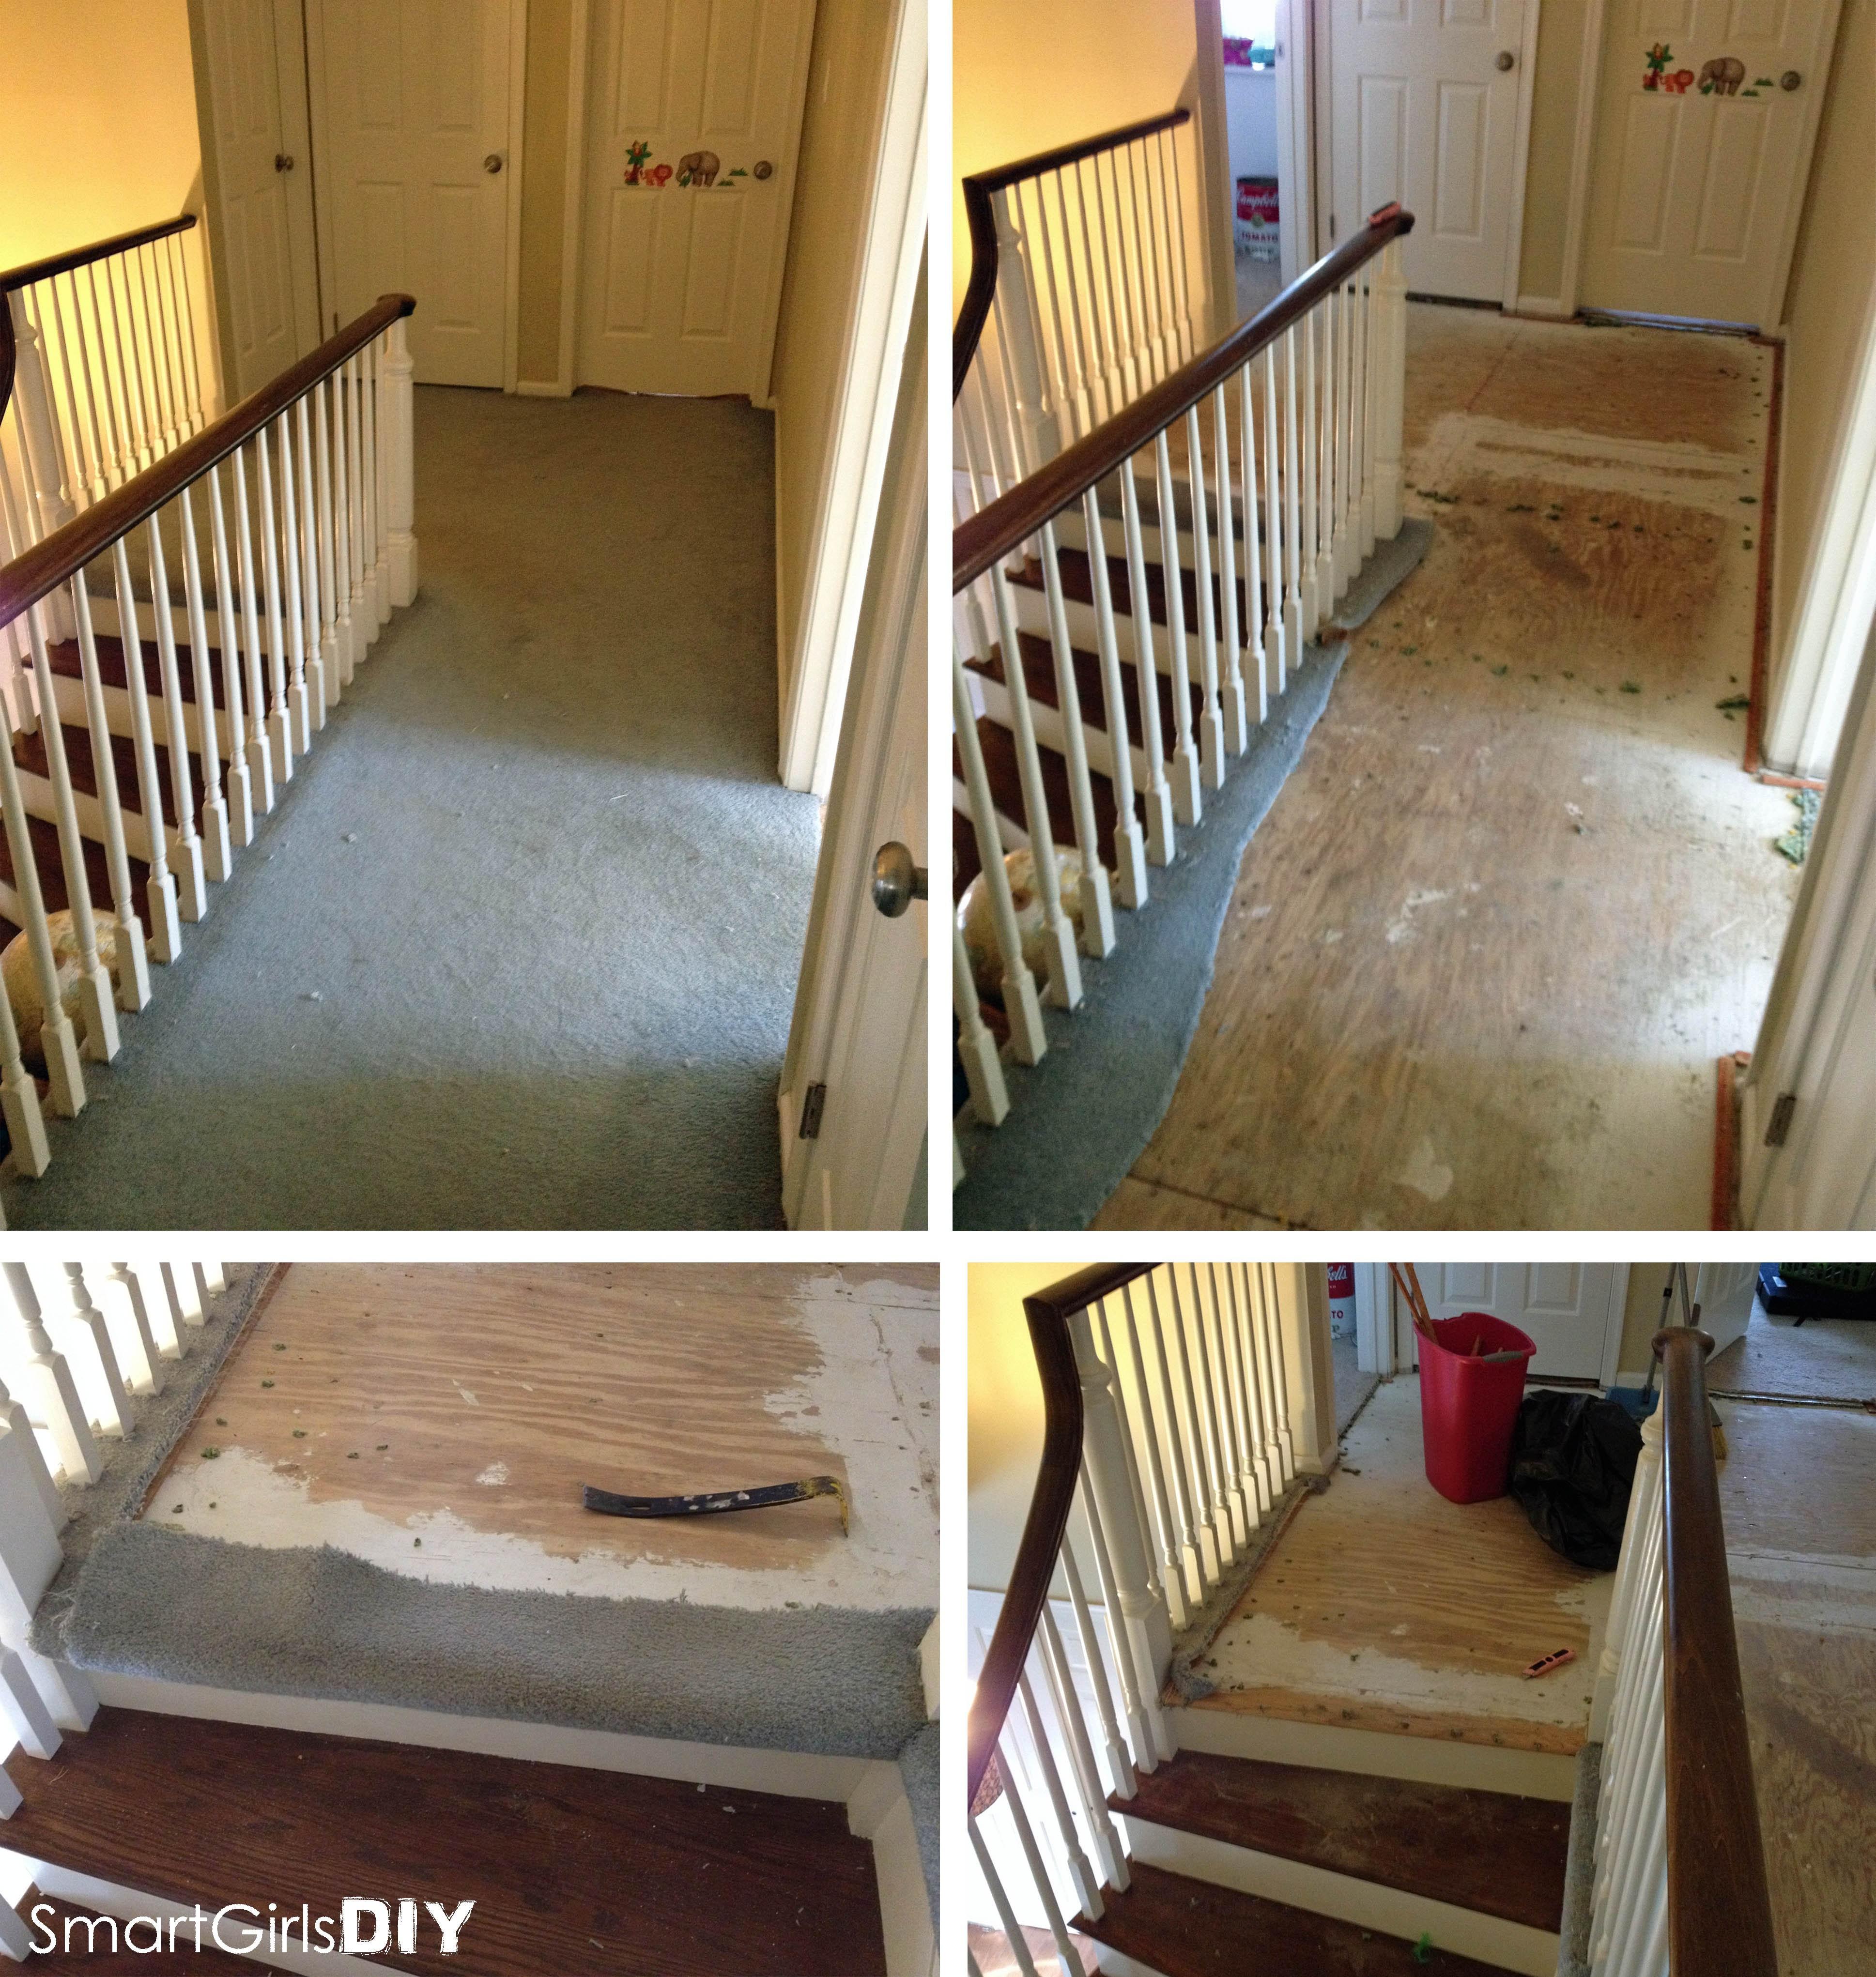 installing engineered hardwood flooring nail down of upstairs hallway 1 installing hardwood floors regarding removing carpet from hallway installing the hardwood floor